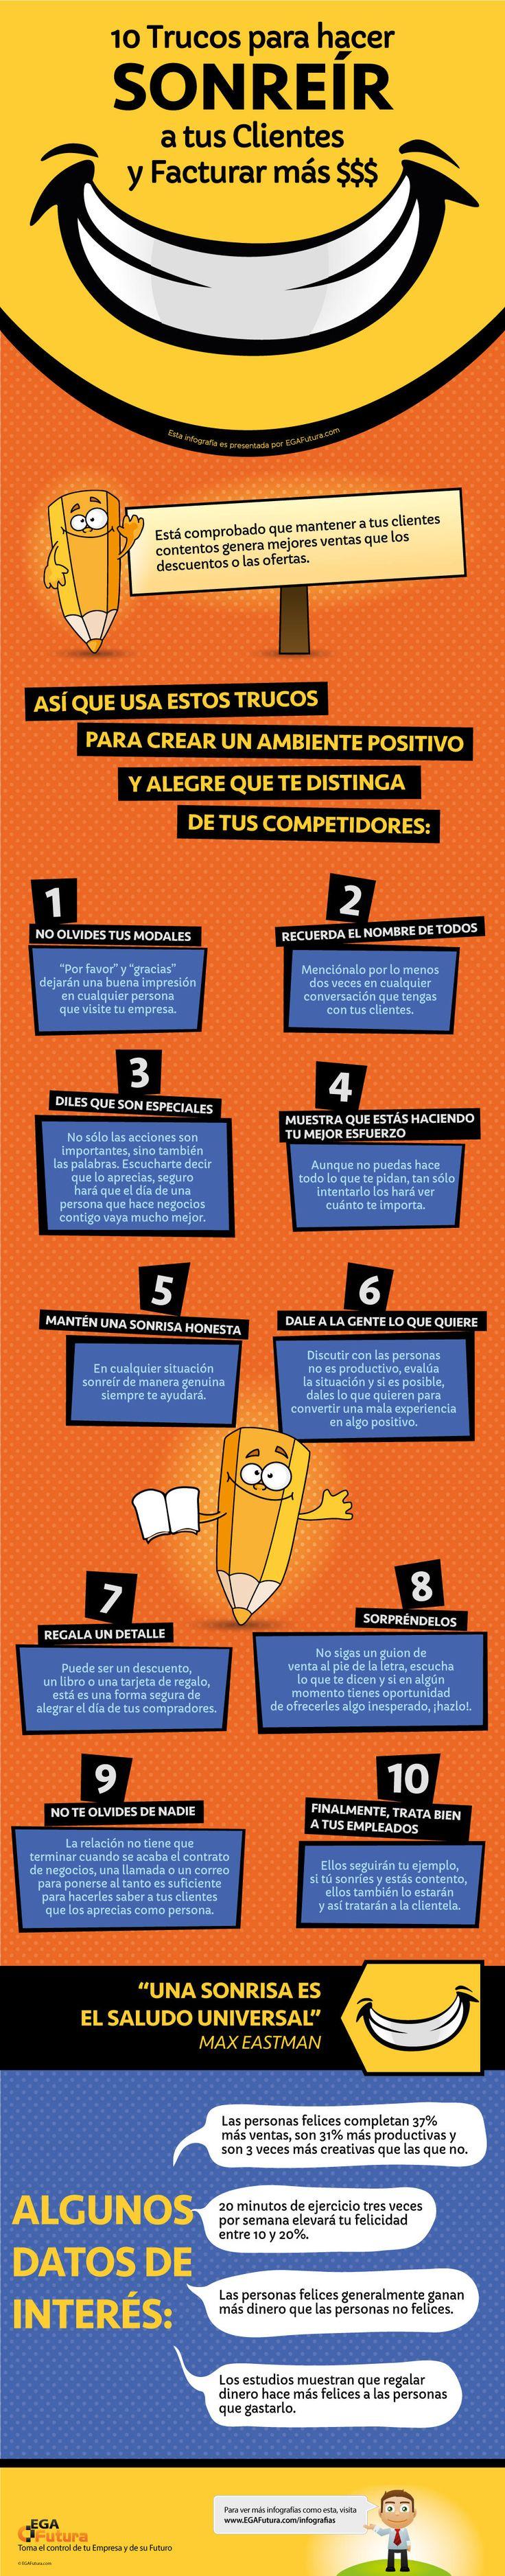 infografia 3 Cris Urzua Ventas